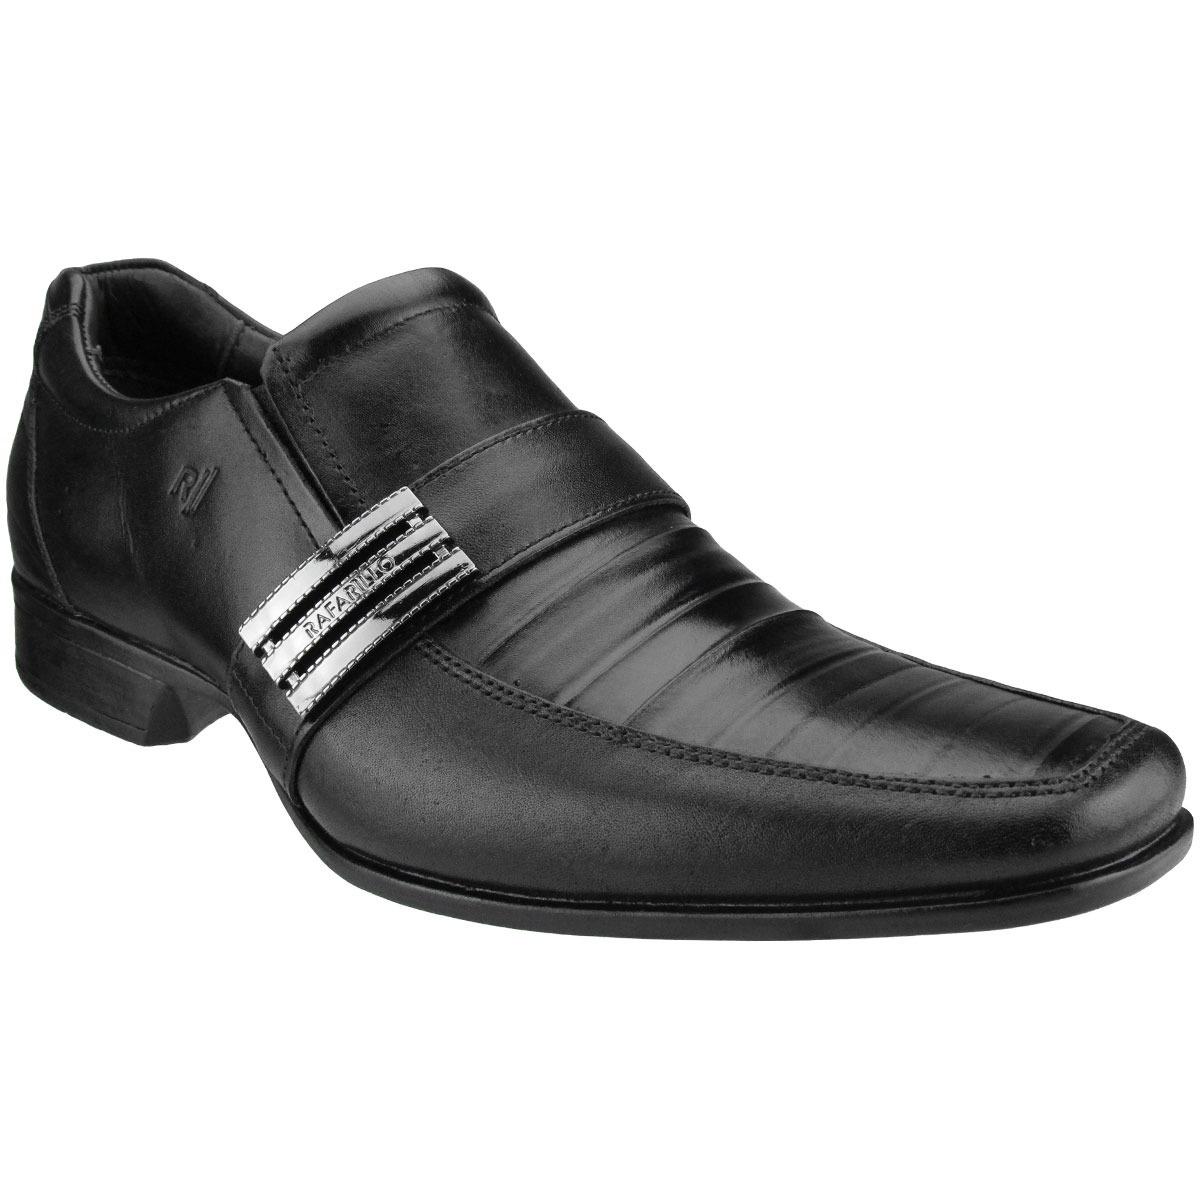 4052dc978 sapato social masculino couro legítimo rafarillo 6808596. Carregando zoom.